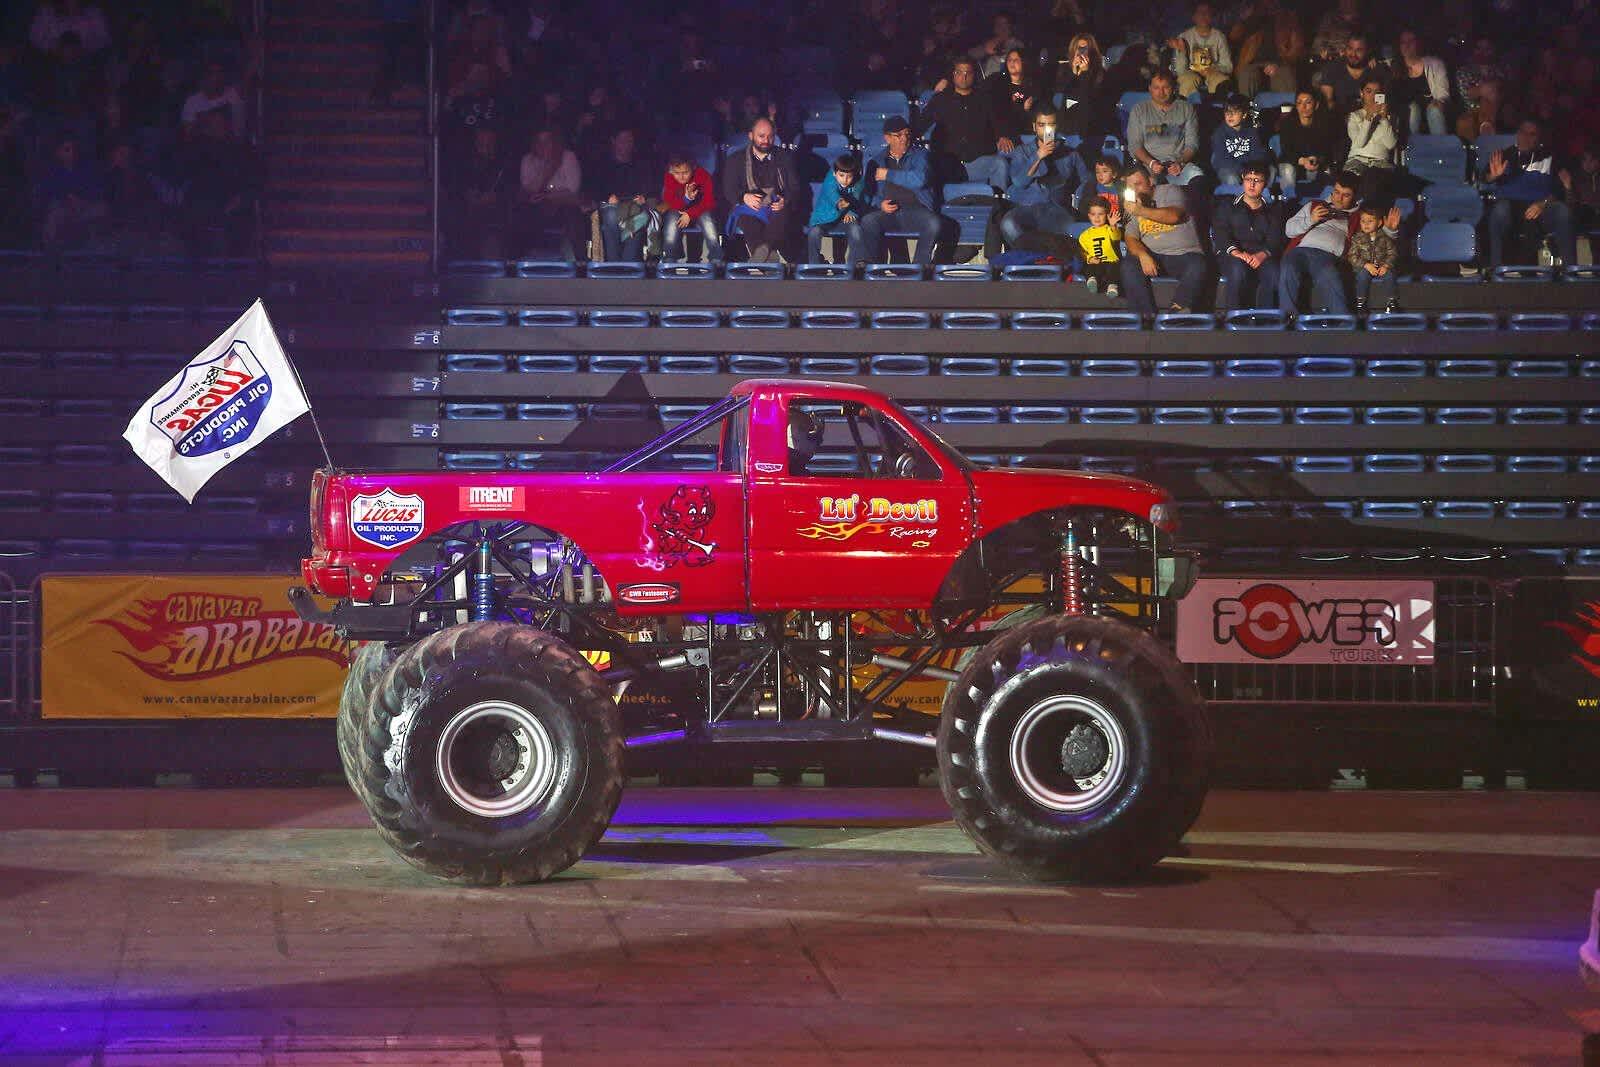 Hot Wheels Monster Trucks Live Louisville 3 13 2021 Tickets Stubhub